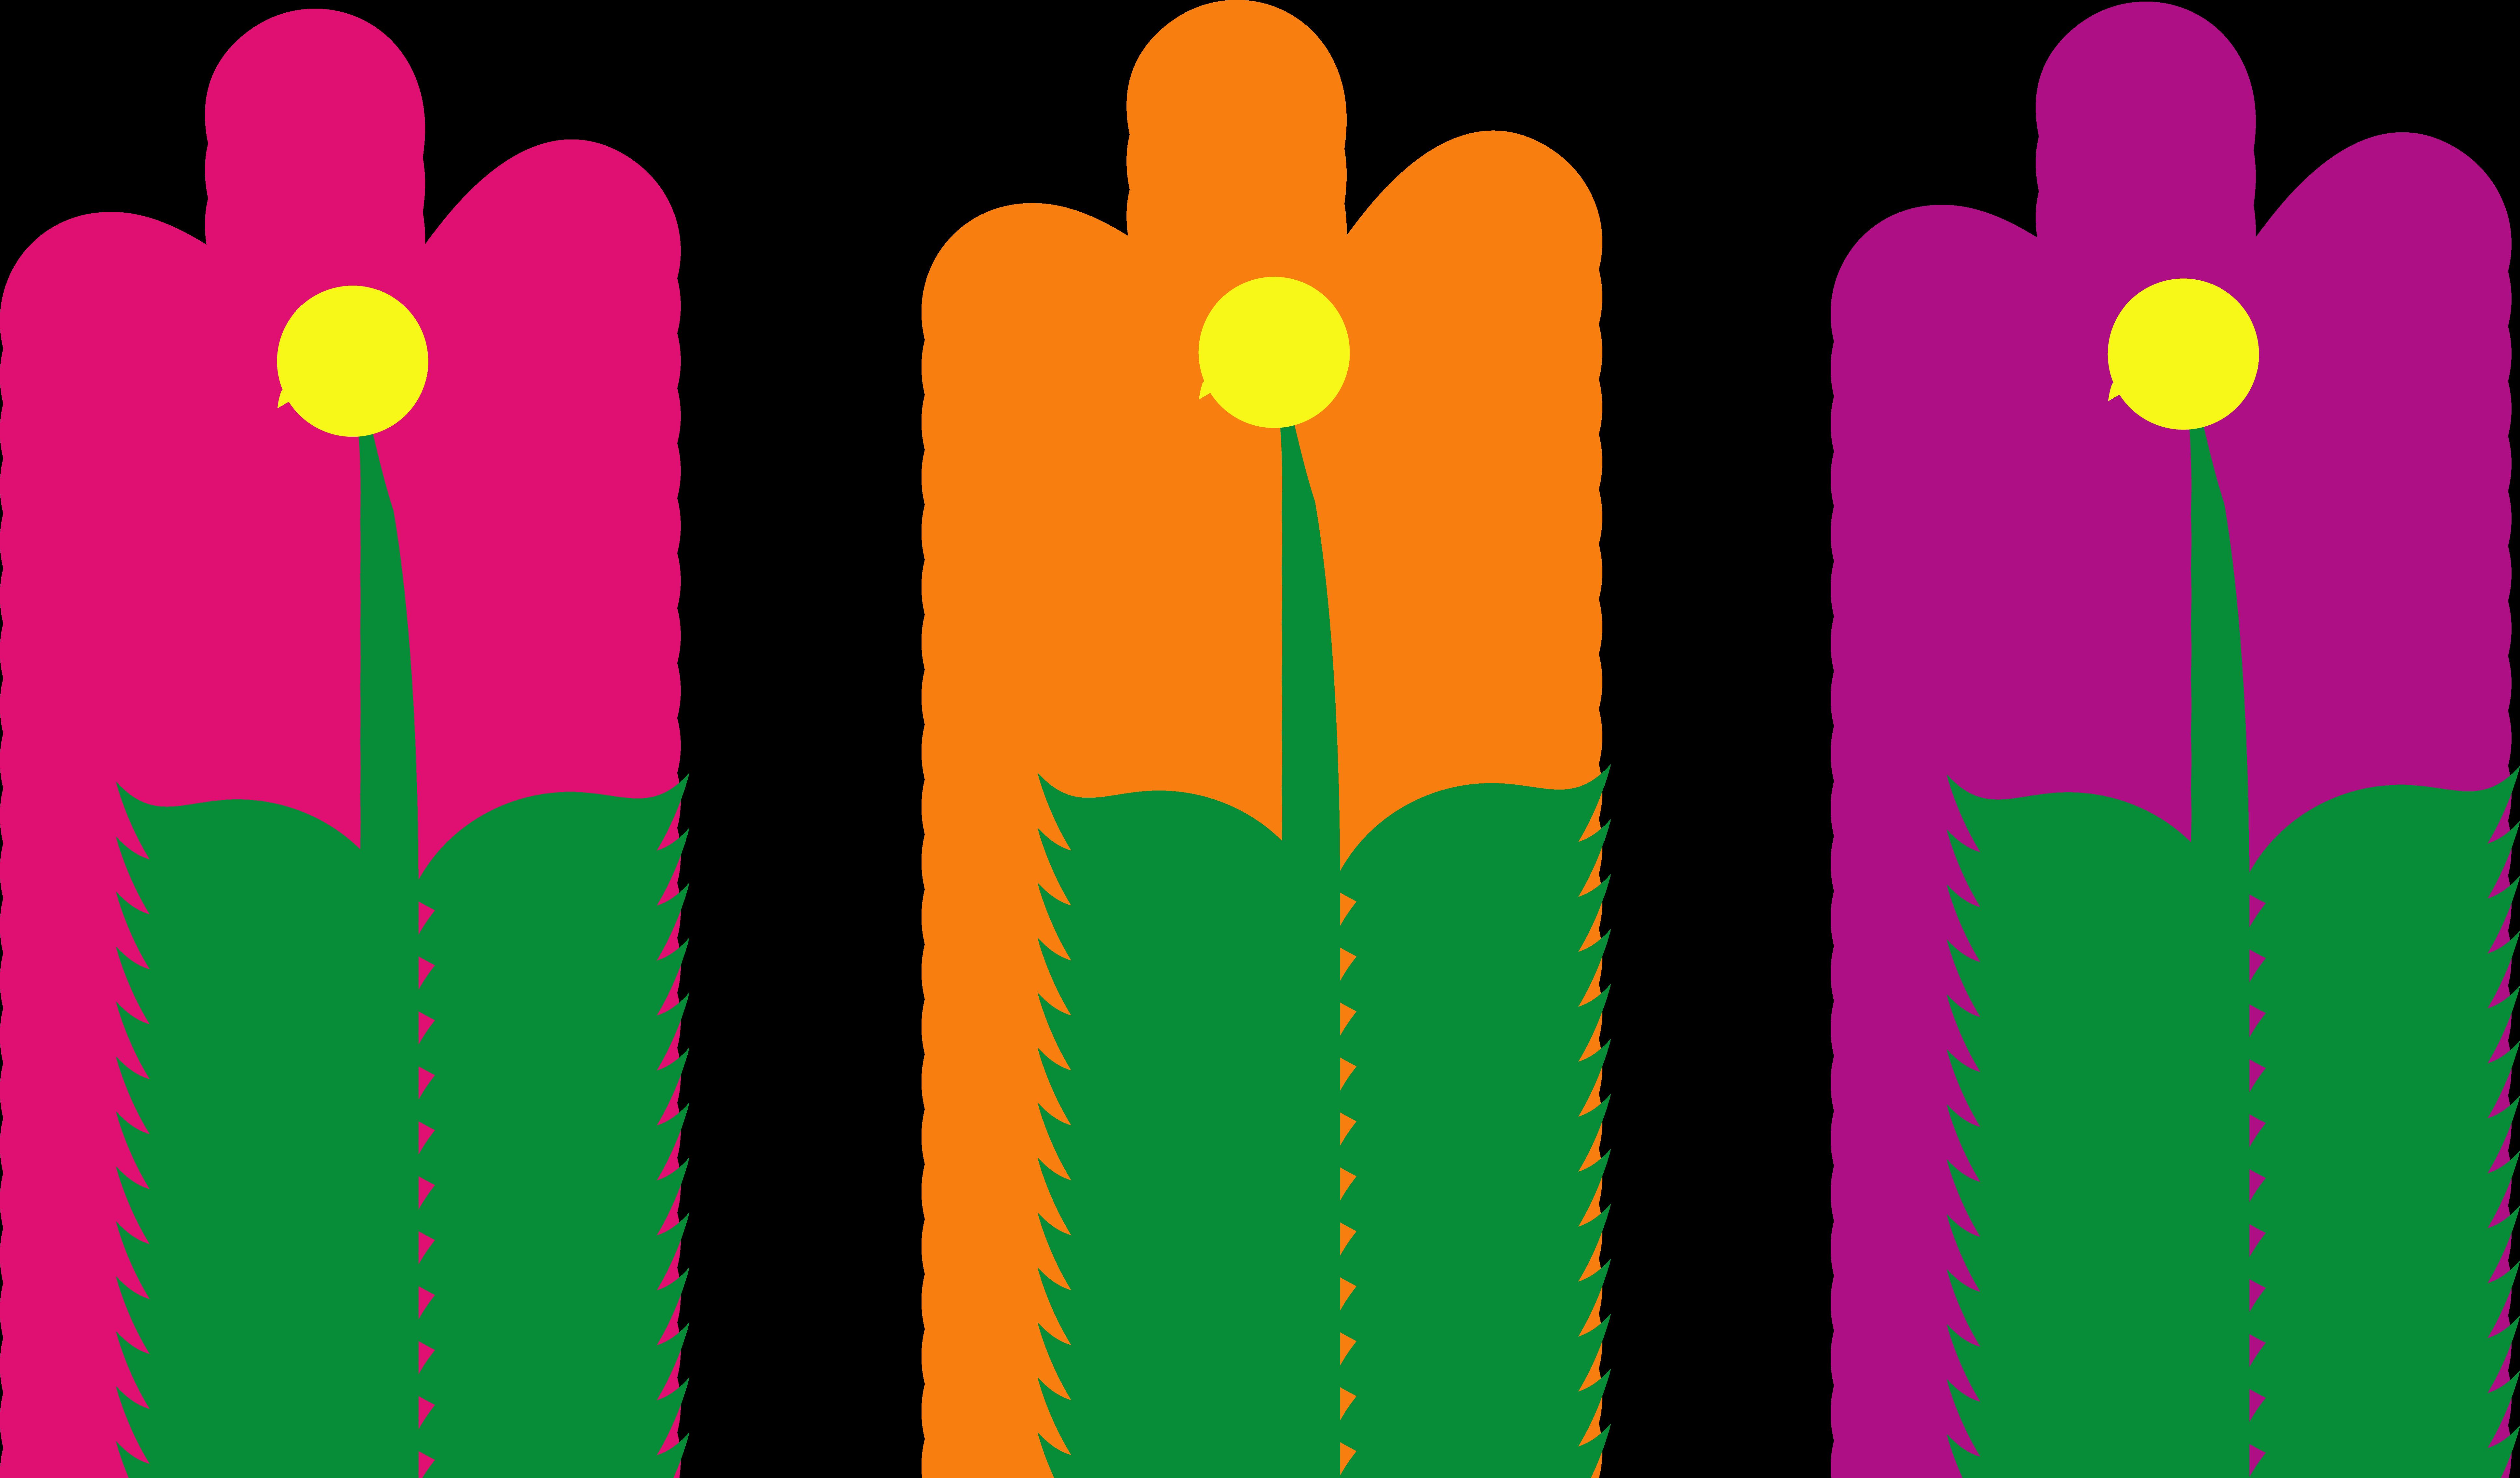 7747x4545 Flowers Clip Art Amp Look At Flowers Clip Art Clip Art Images